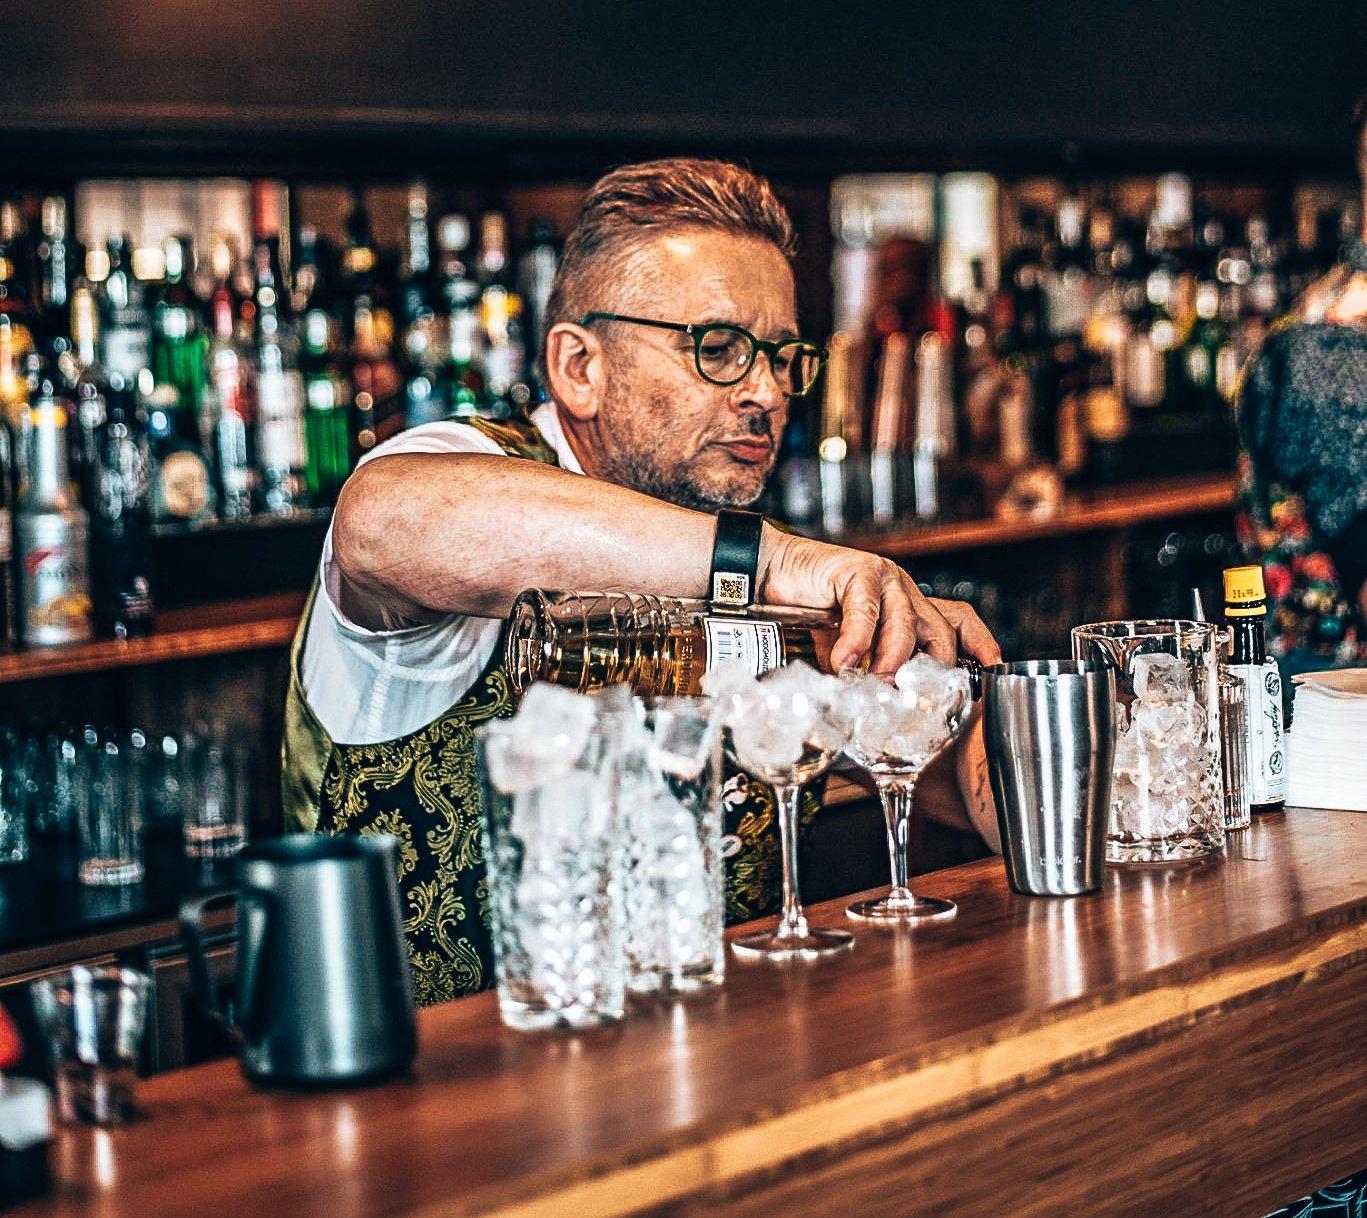 Anton Menkveld, MixxiM Lounge, Alles over gin.